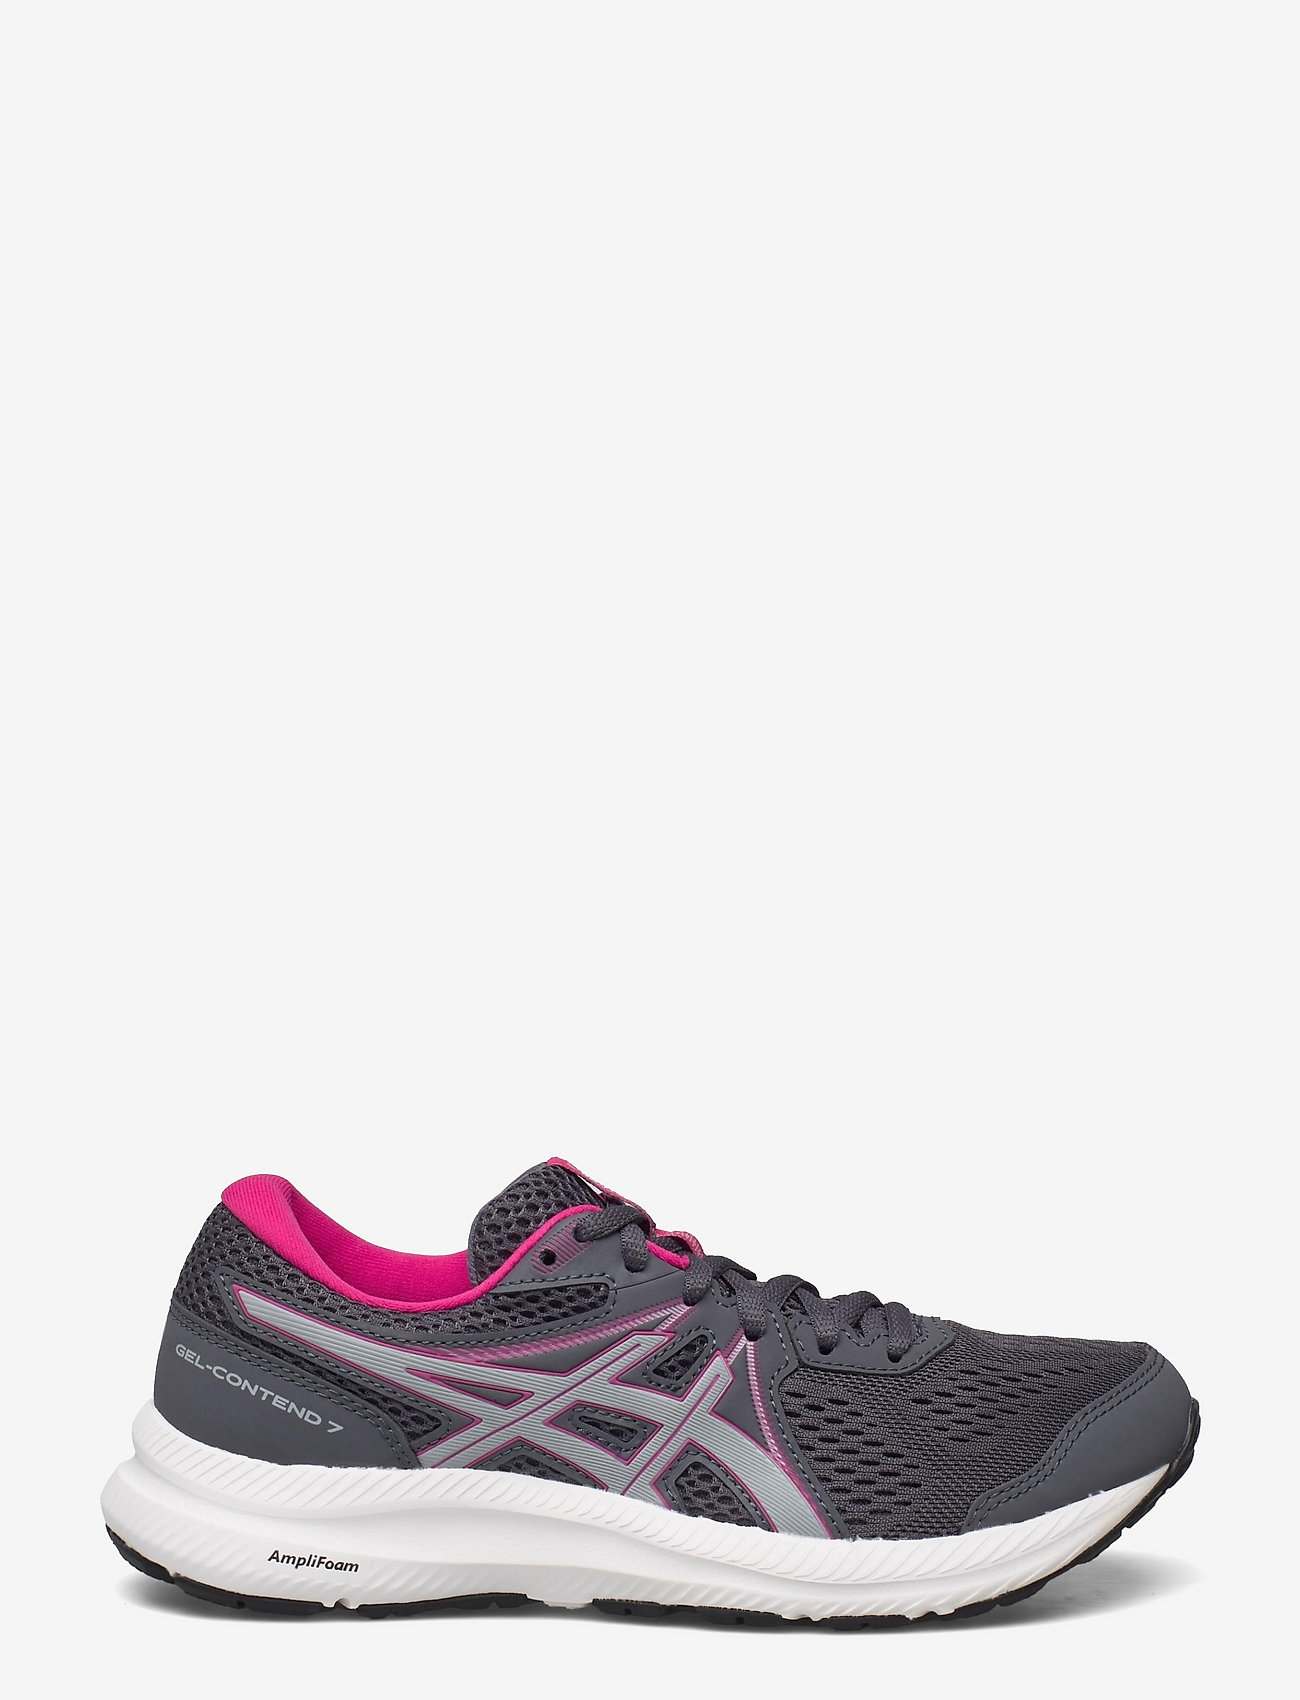 Asics - GEL-CONTEND 7 - running shoes - carrier grey/piedmont grey - 1